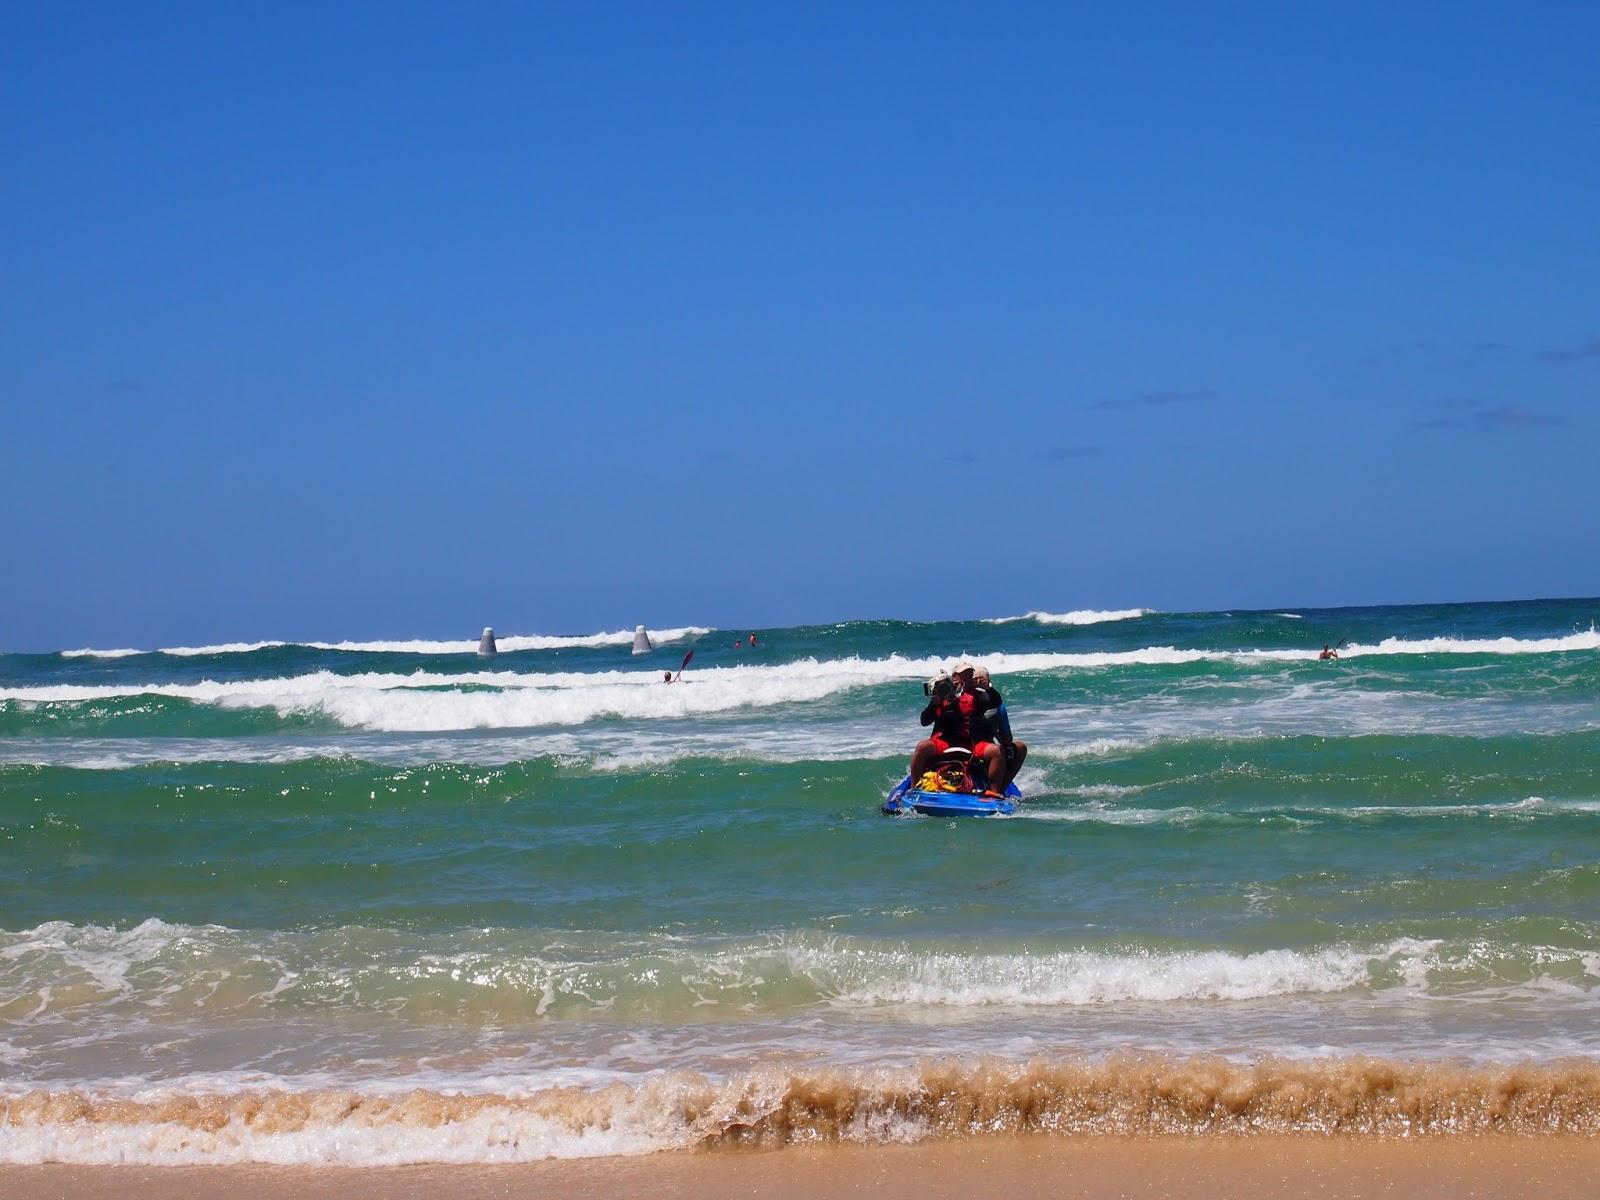 Camera Man on Jet ski Surf competition